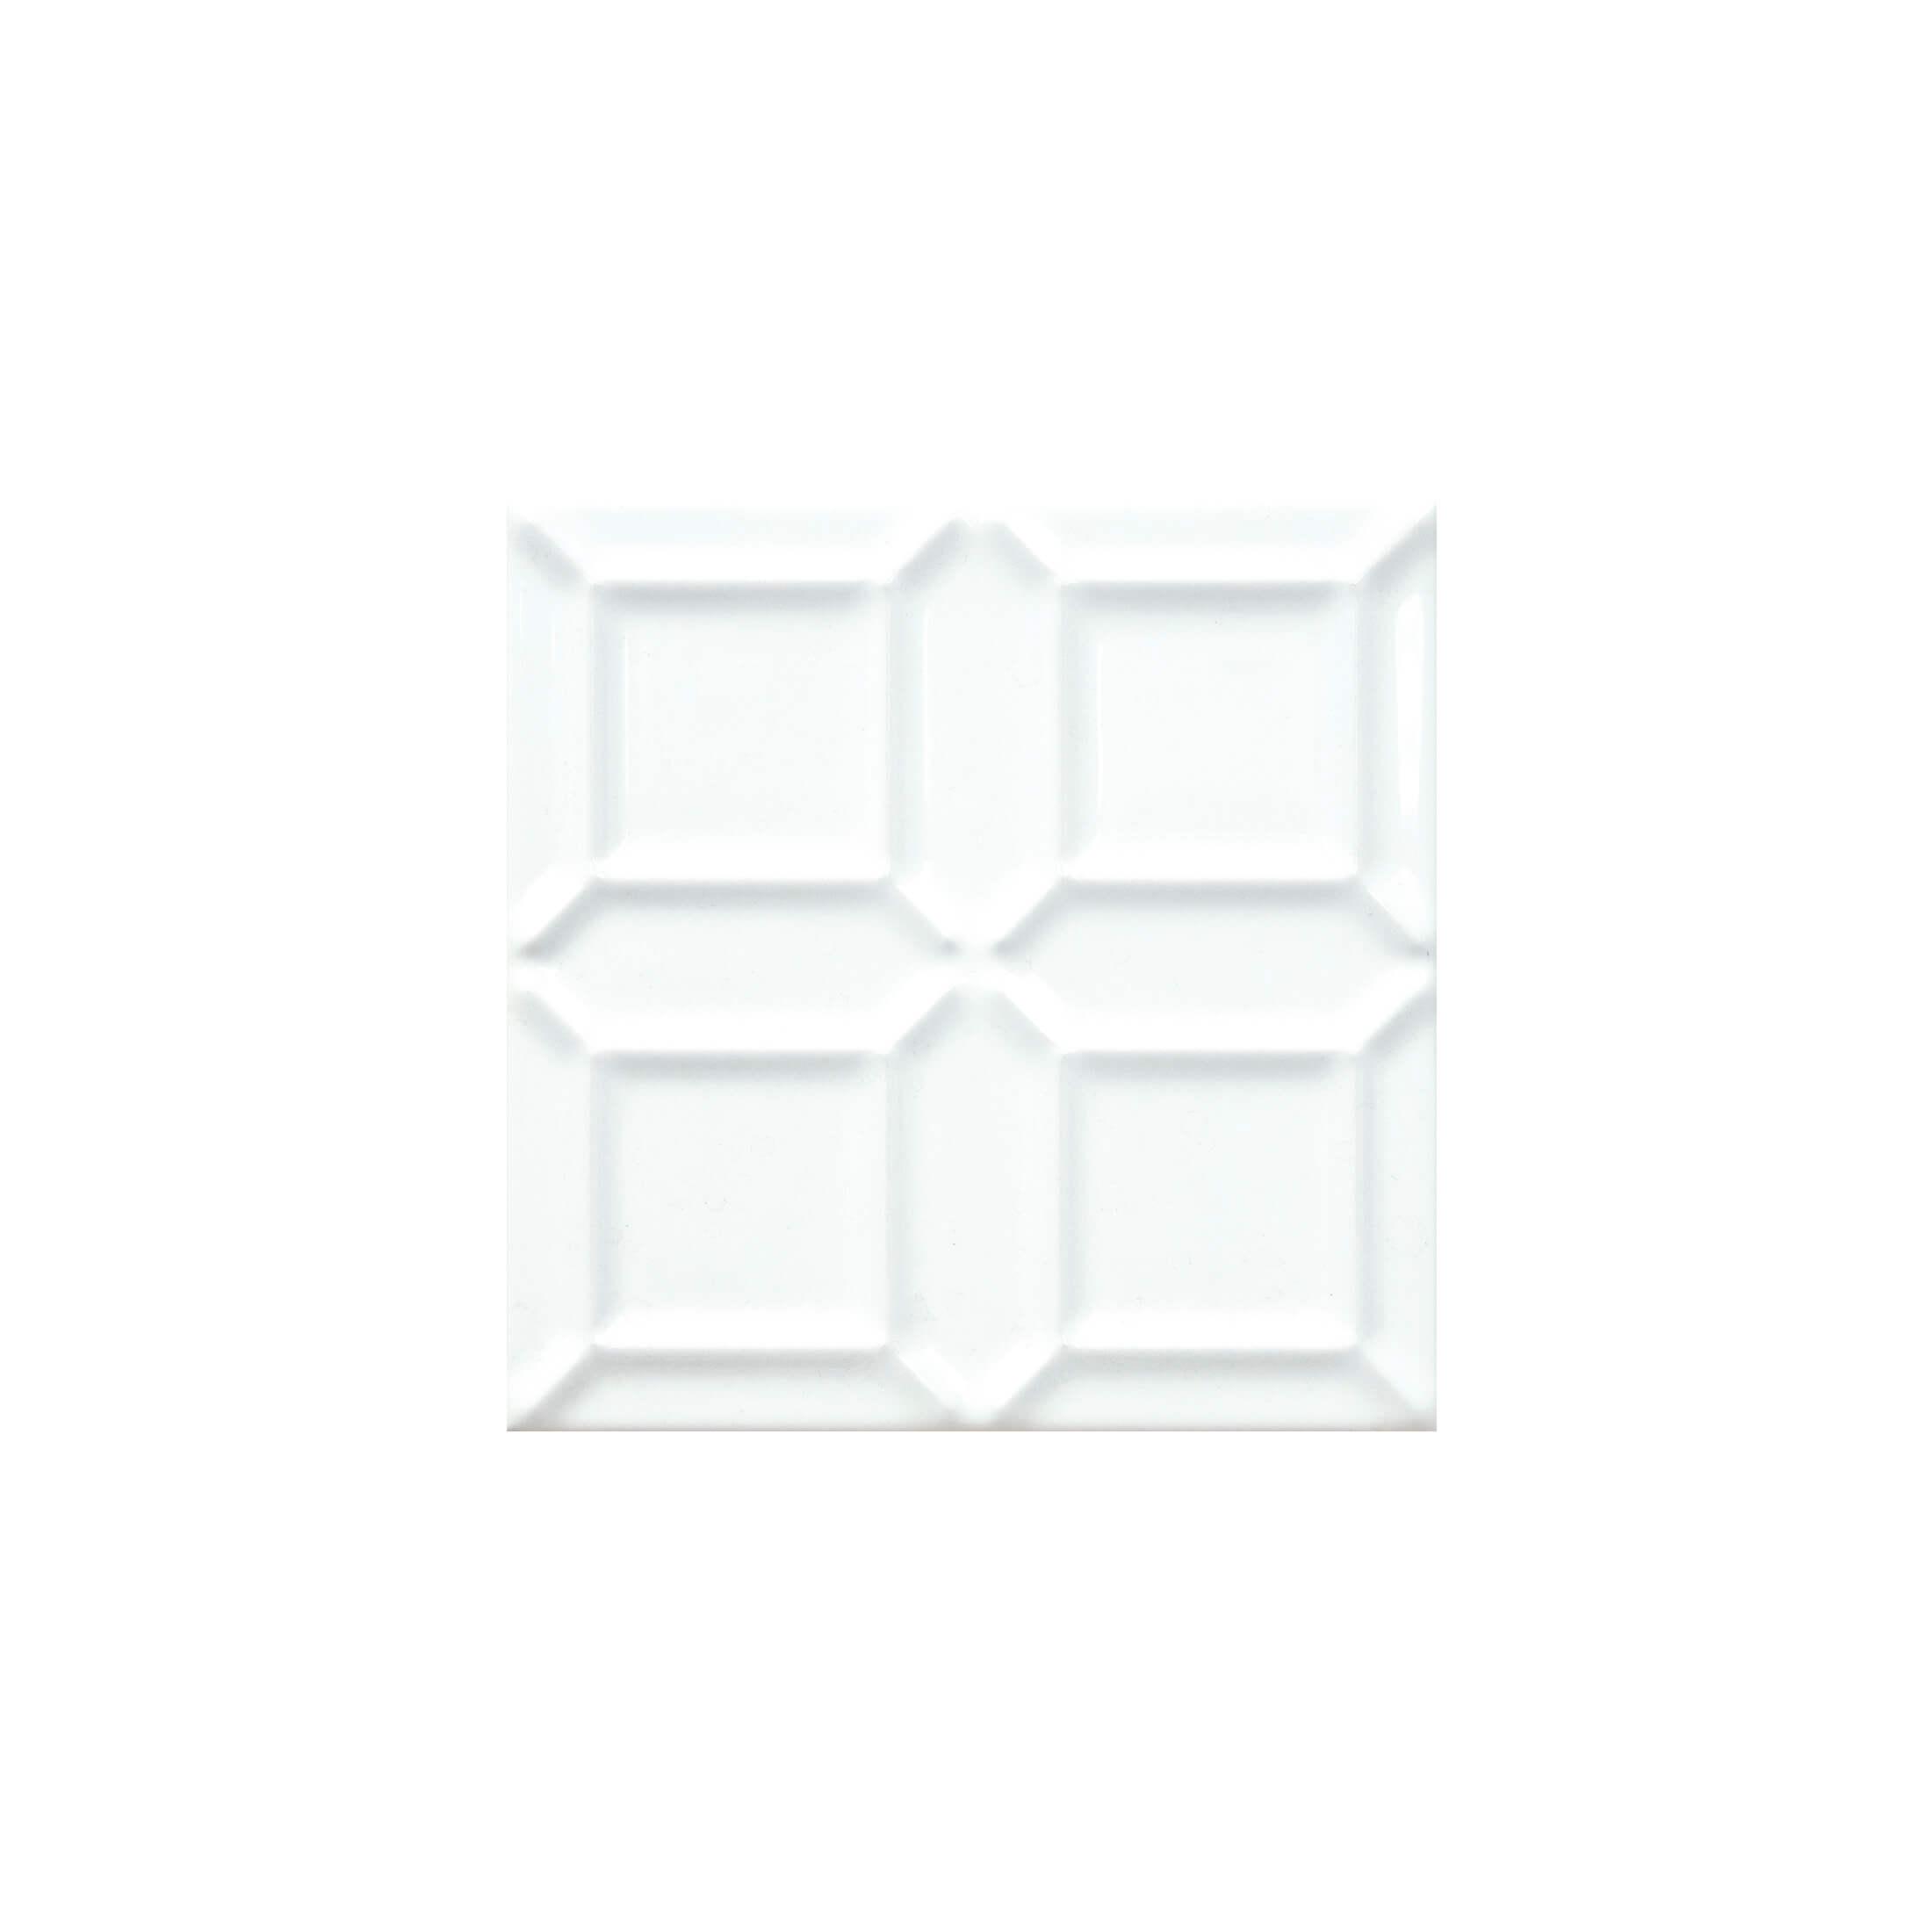 ADNE1109 - LISO EDGE - 15 cm X 15 cm